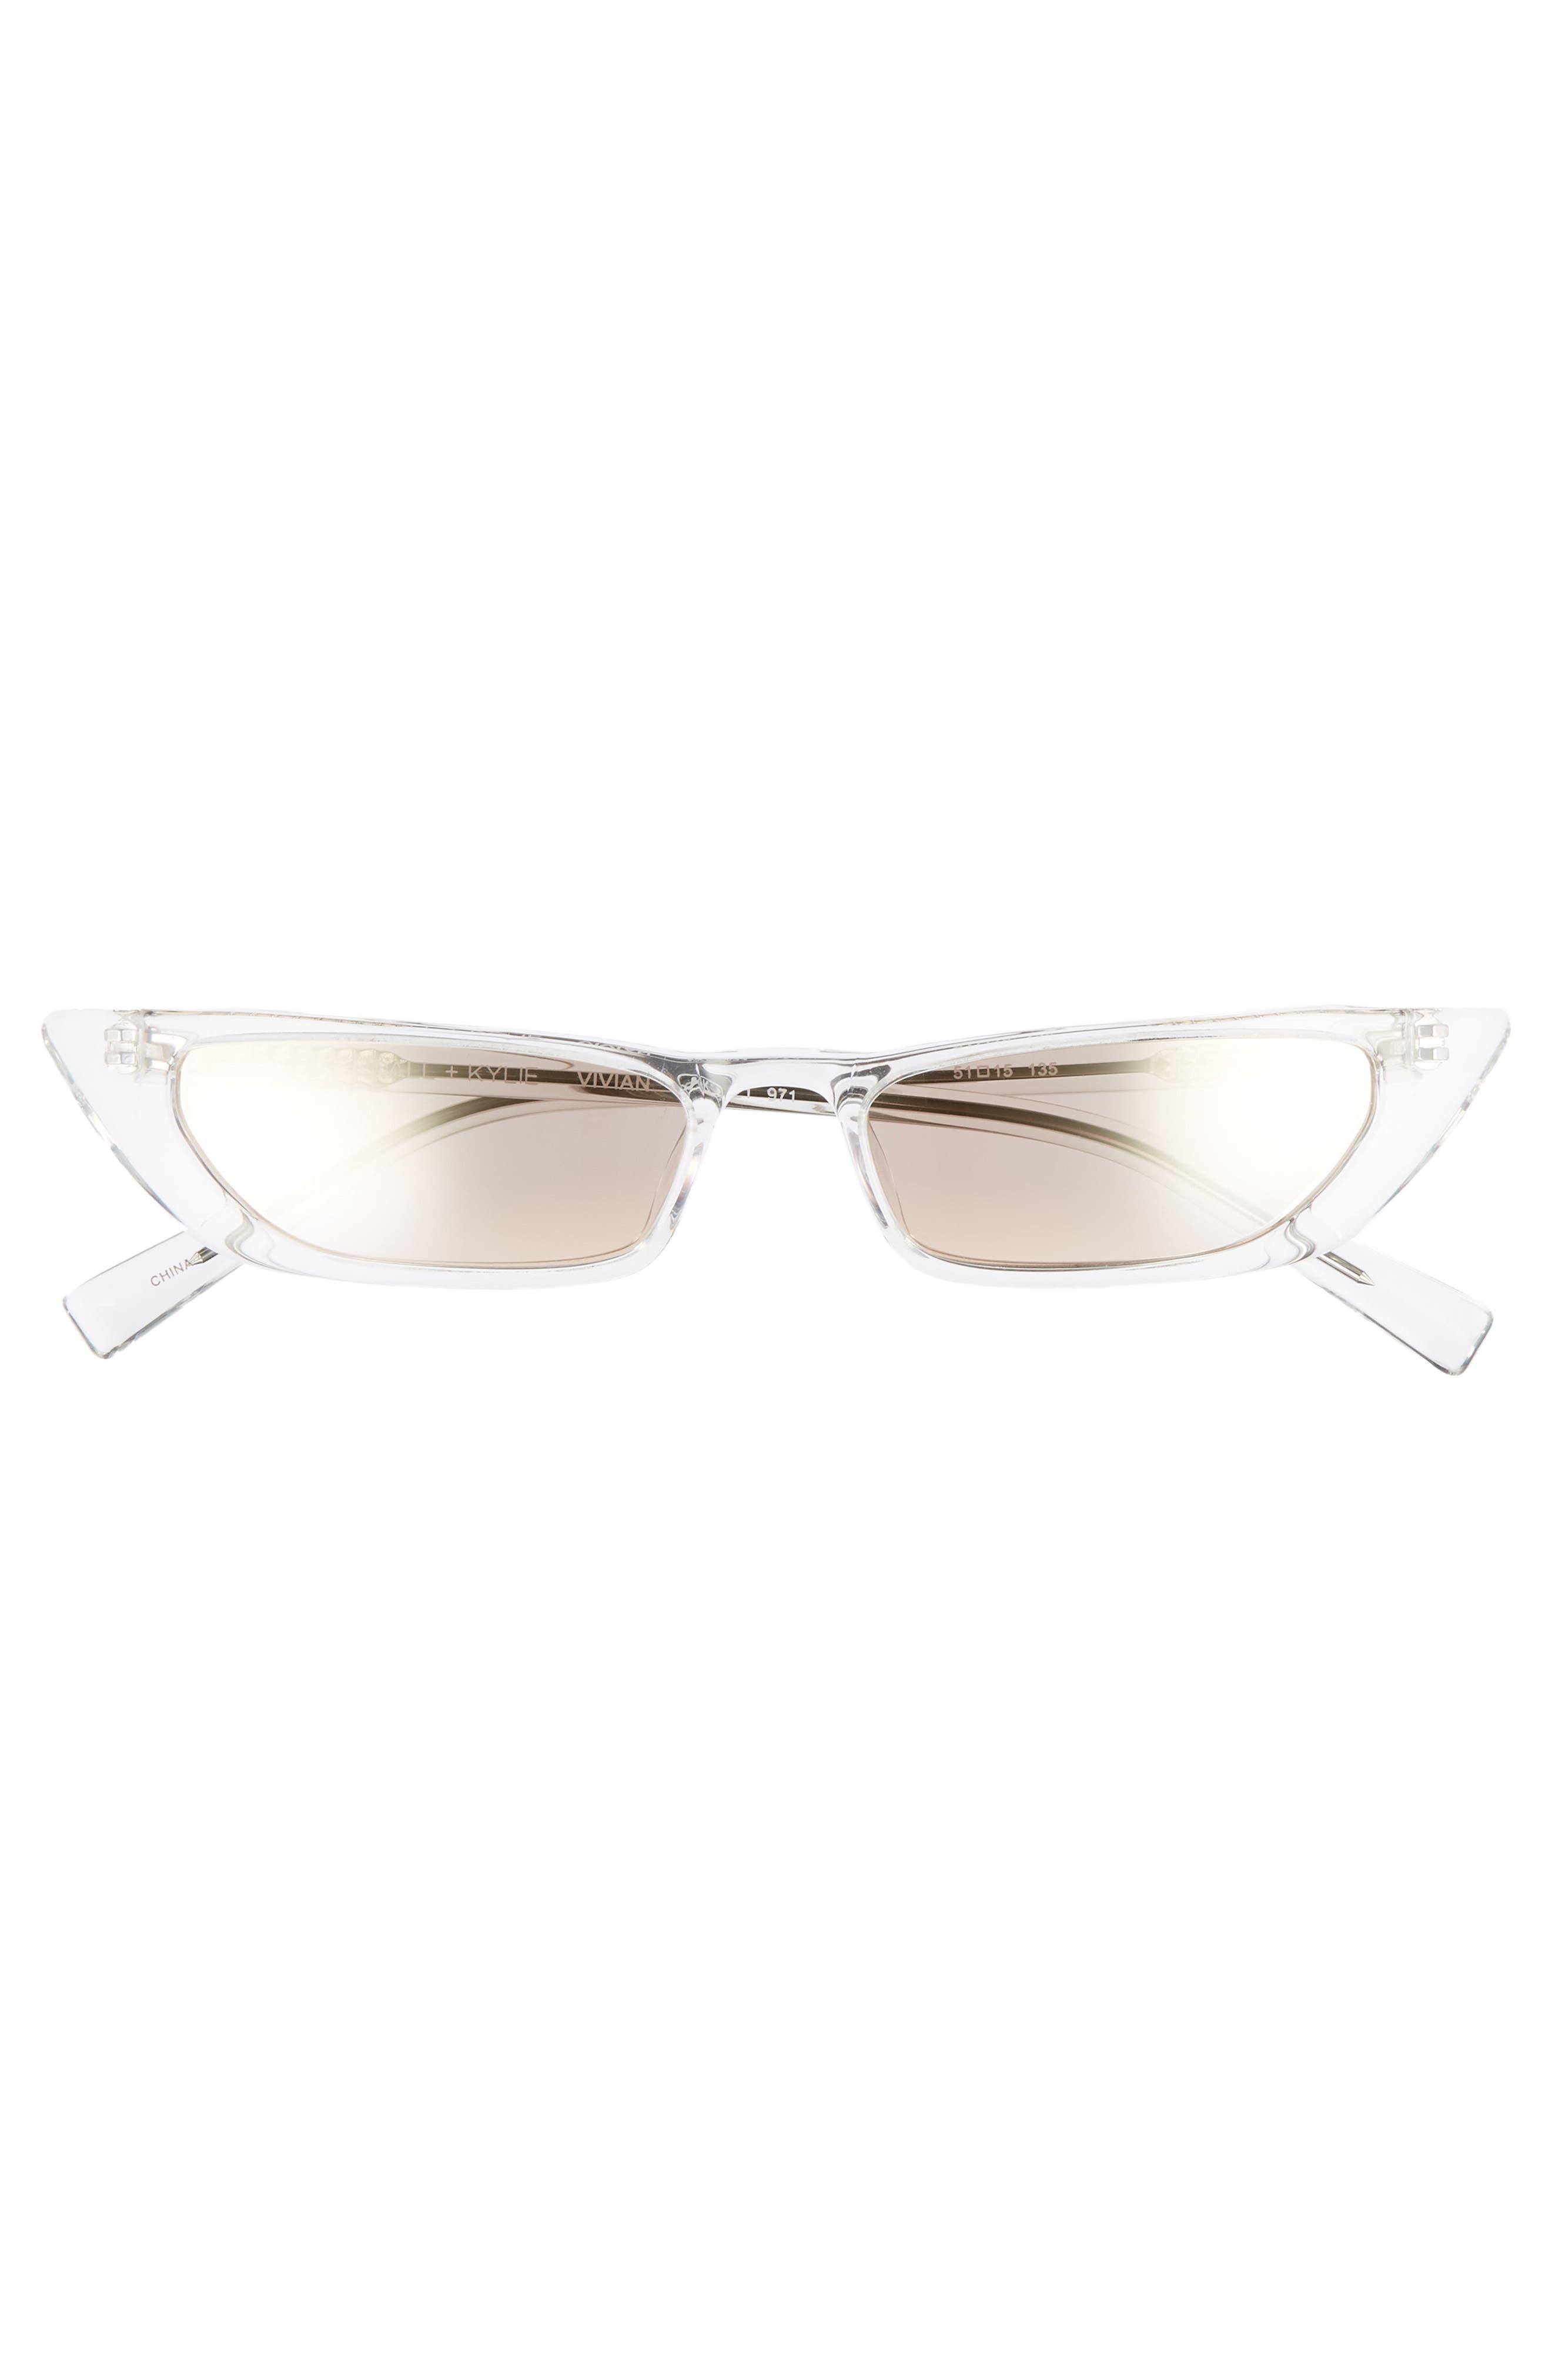 KENDALL + KYLIE,                             Vivian Extreme 51mm Cat Eye Sunglasses,                             Alternate thumbnail 3, color,                             106